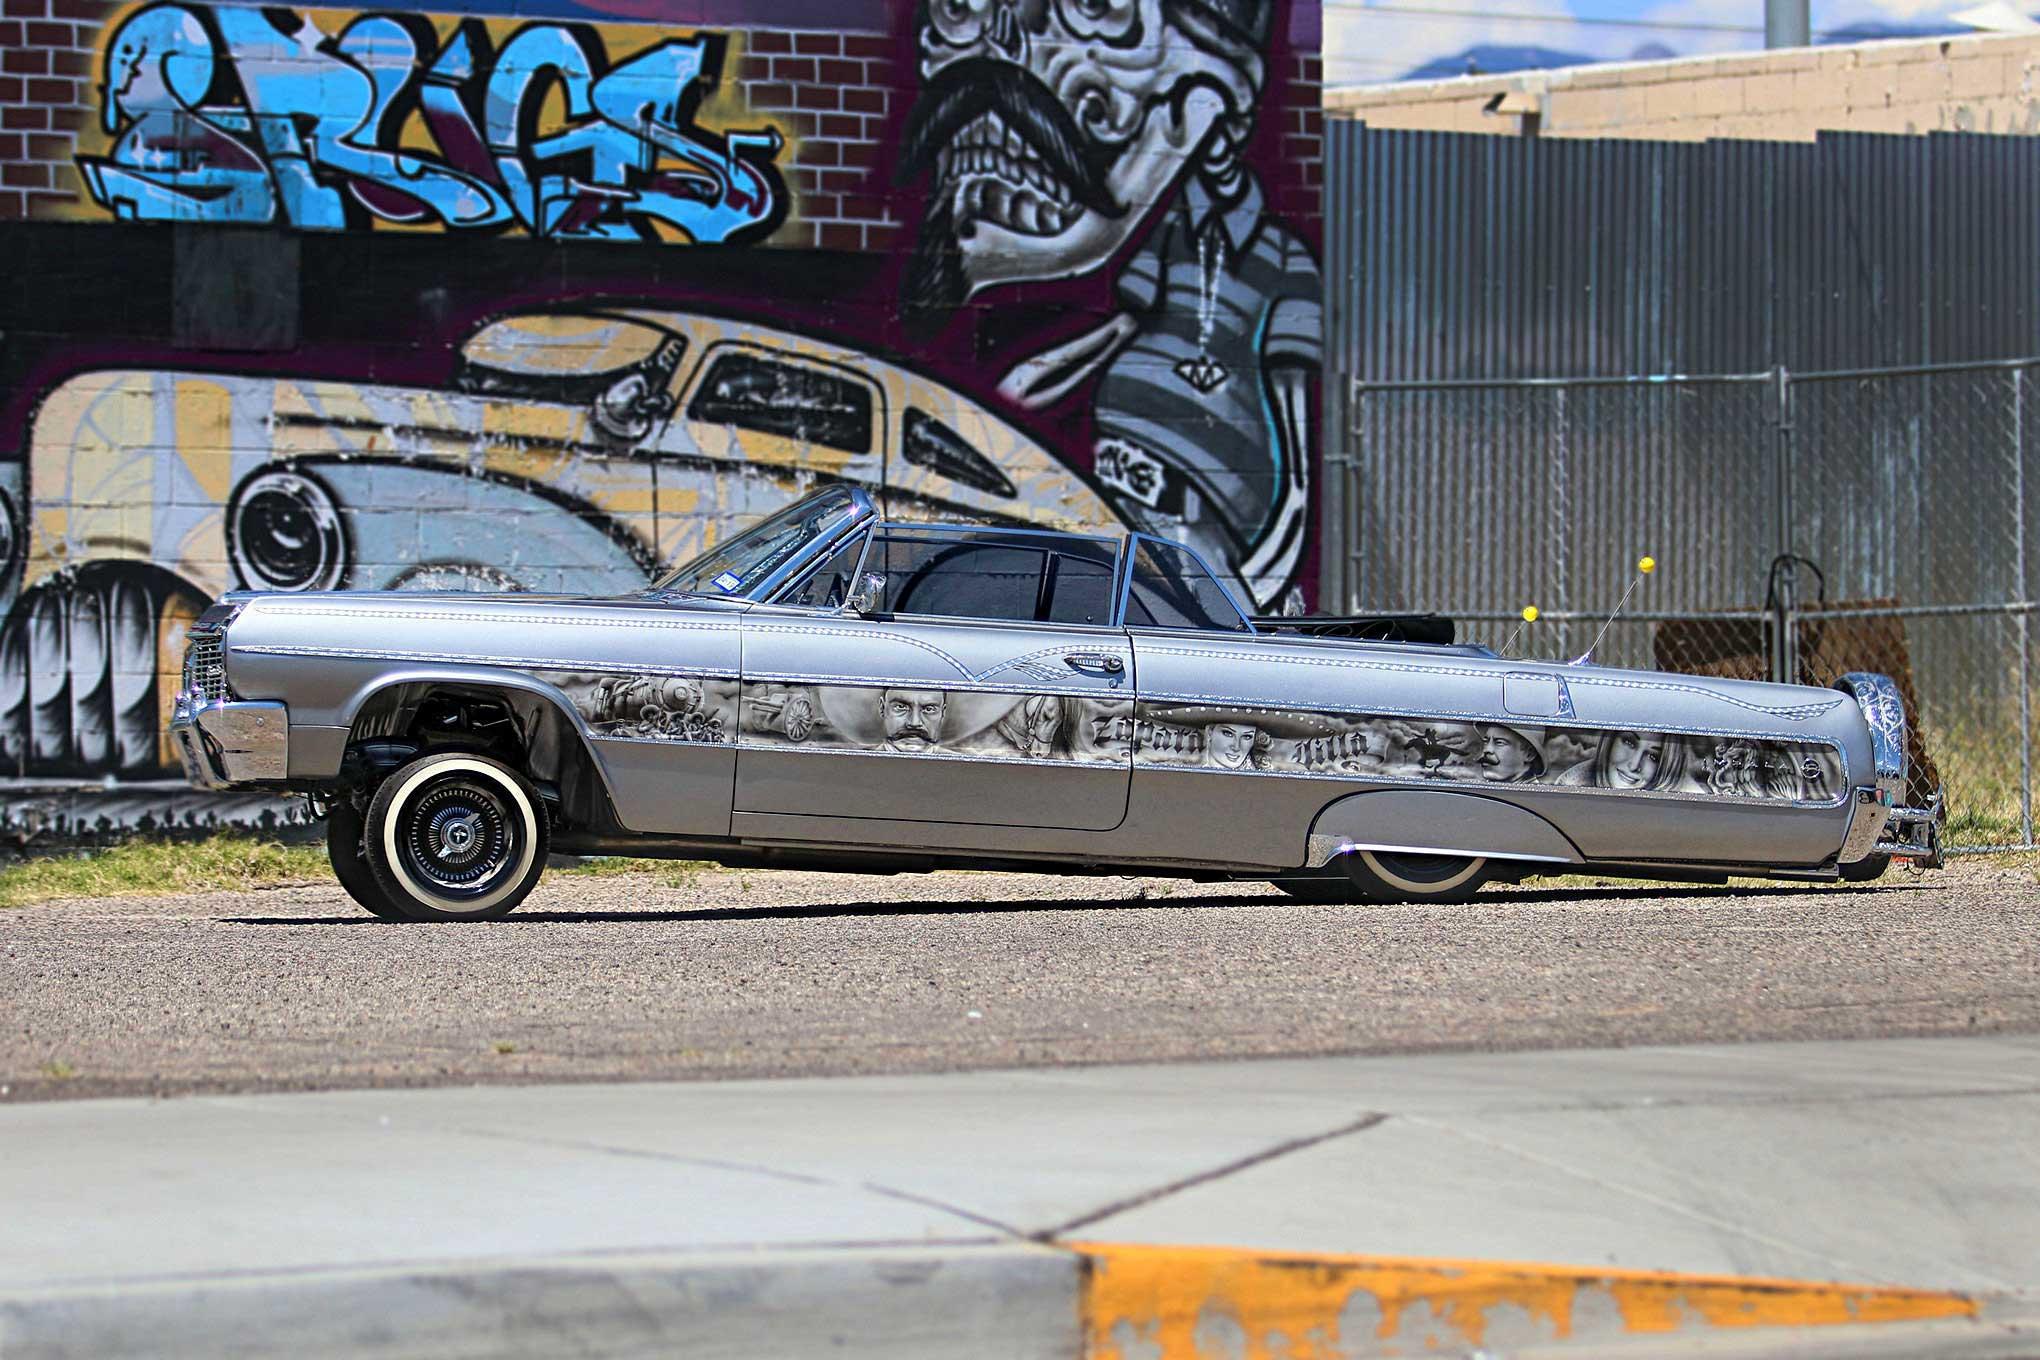 1964 Chevrolet Impala - Rust Bucket